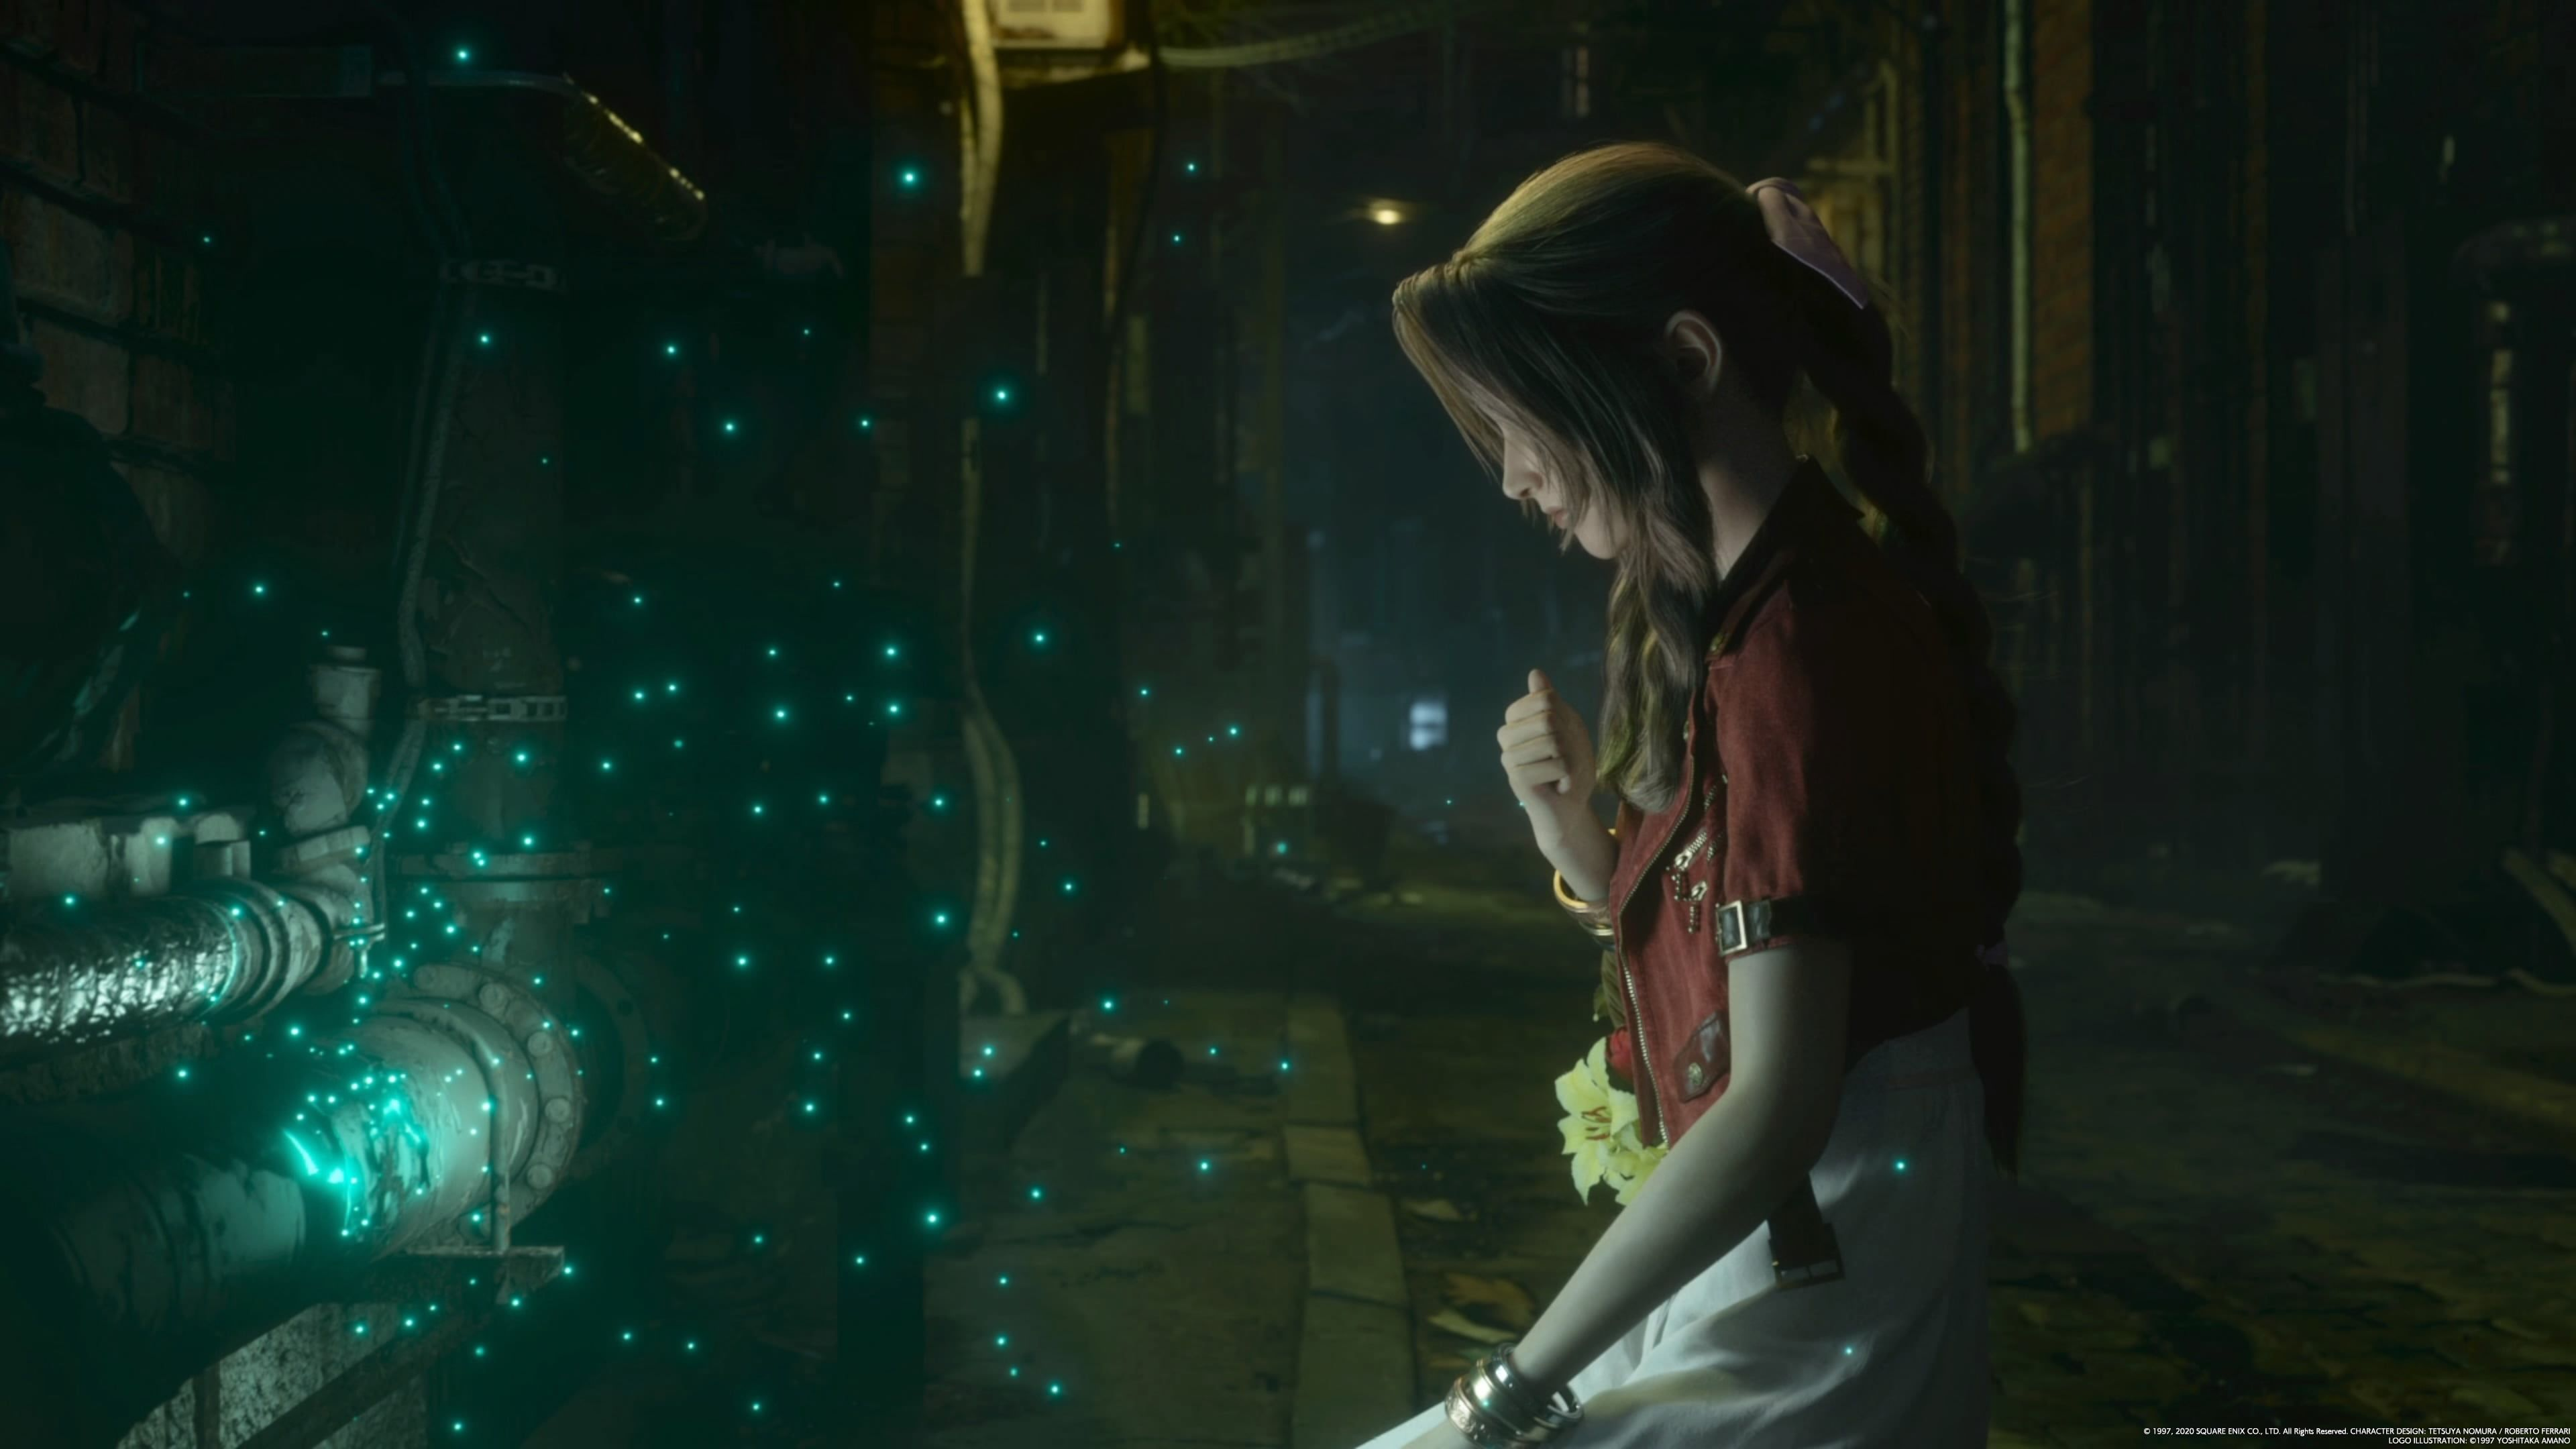 Final Fantasy Vii Aerith Gainsborough 4k Wallpaper Hdwallpaper Desktop In 2020 Final Fantasy Vii Final Fantasy Final Fantasy Characters